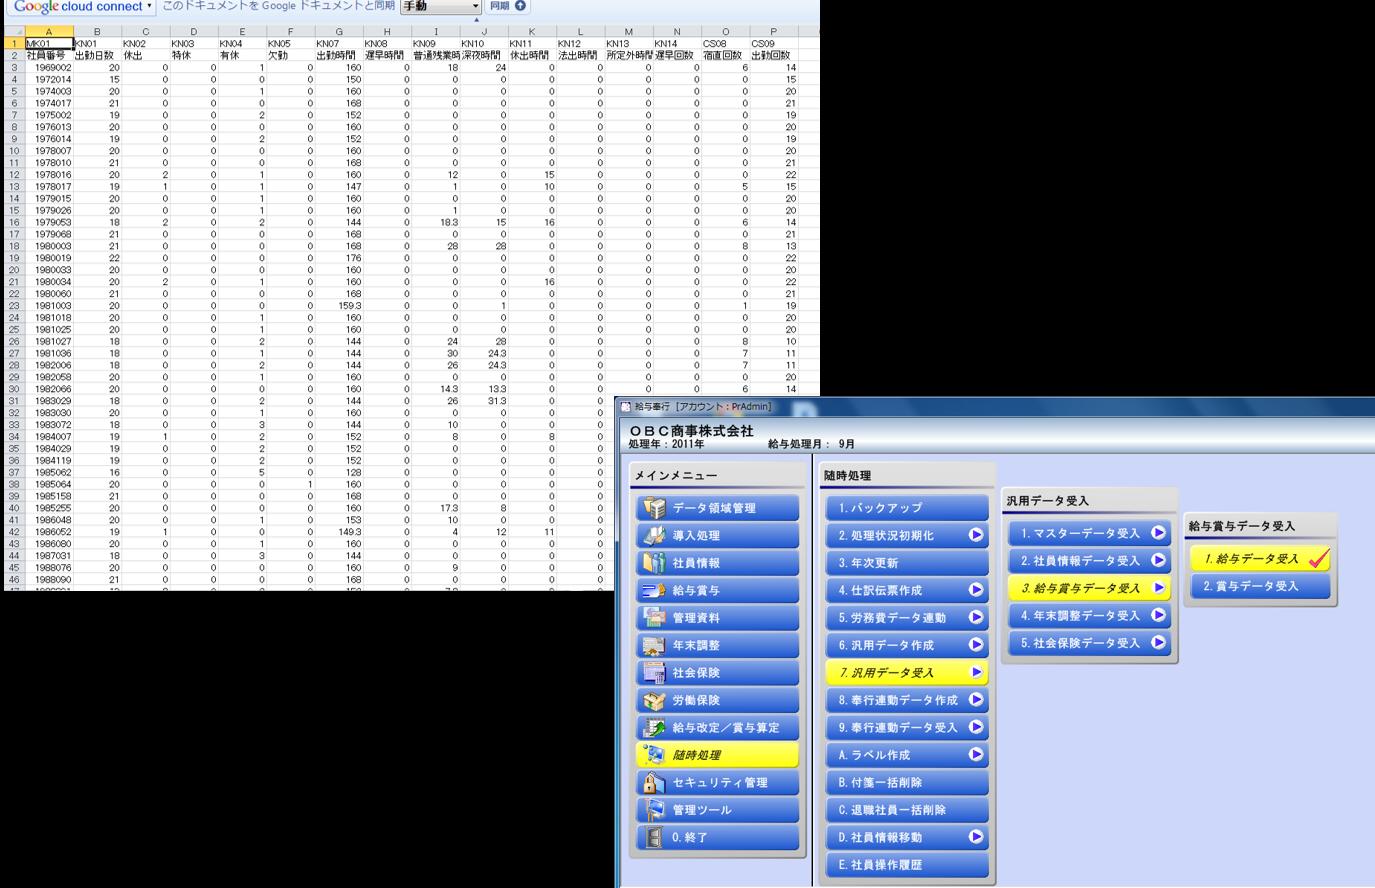 勤務集計chart16